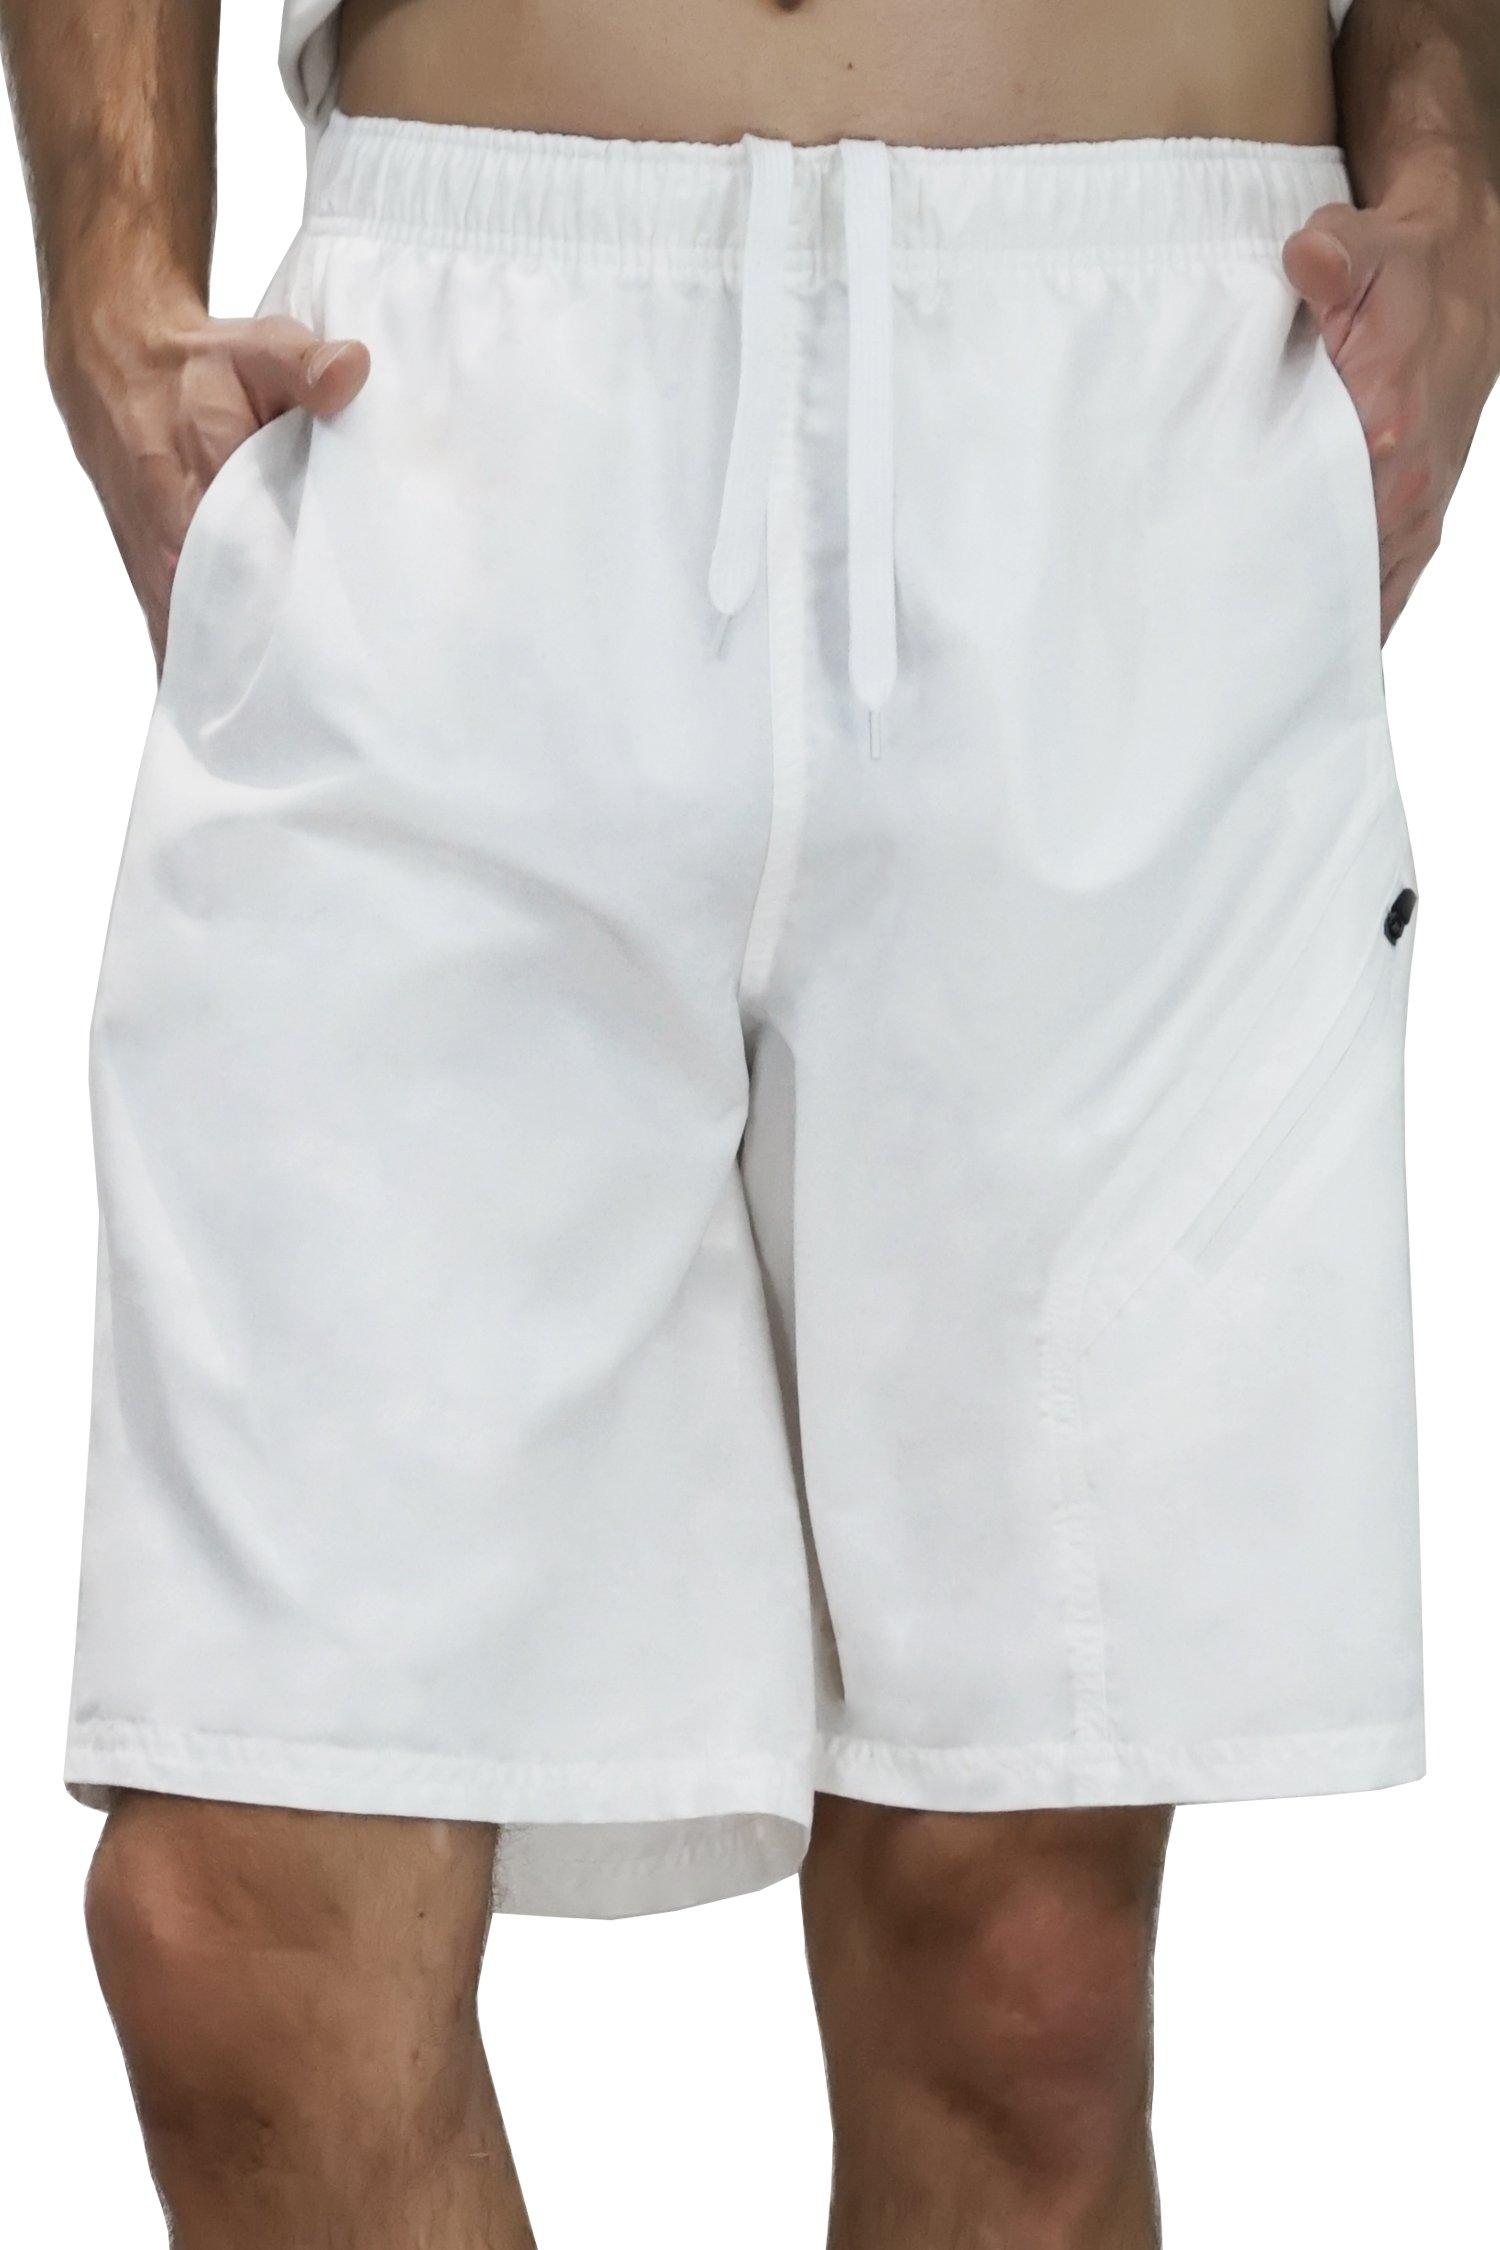 Super 777 Men's Board Shorts Swim Shorts with Side Pocket Shorts Large White